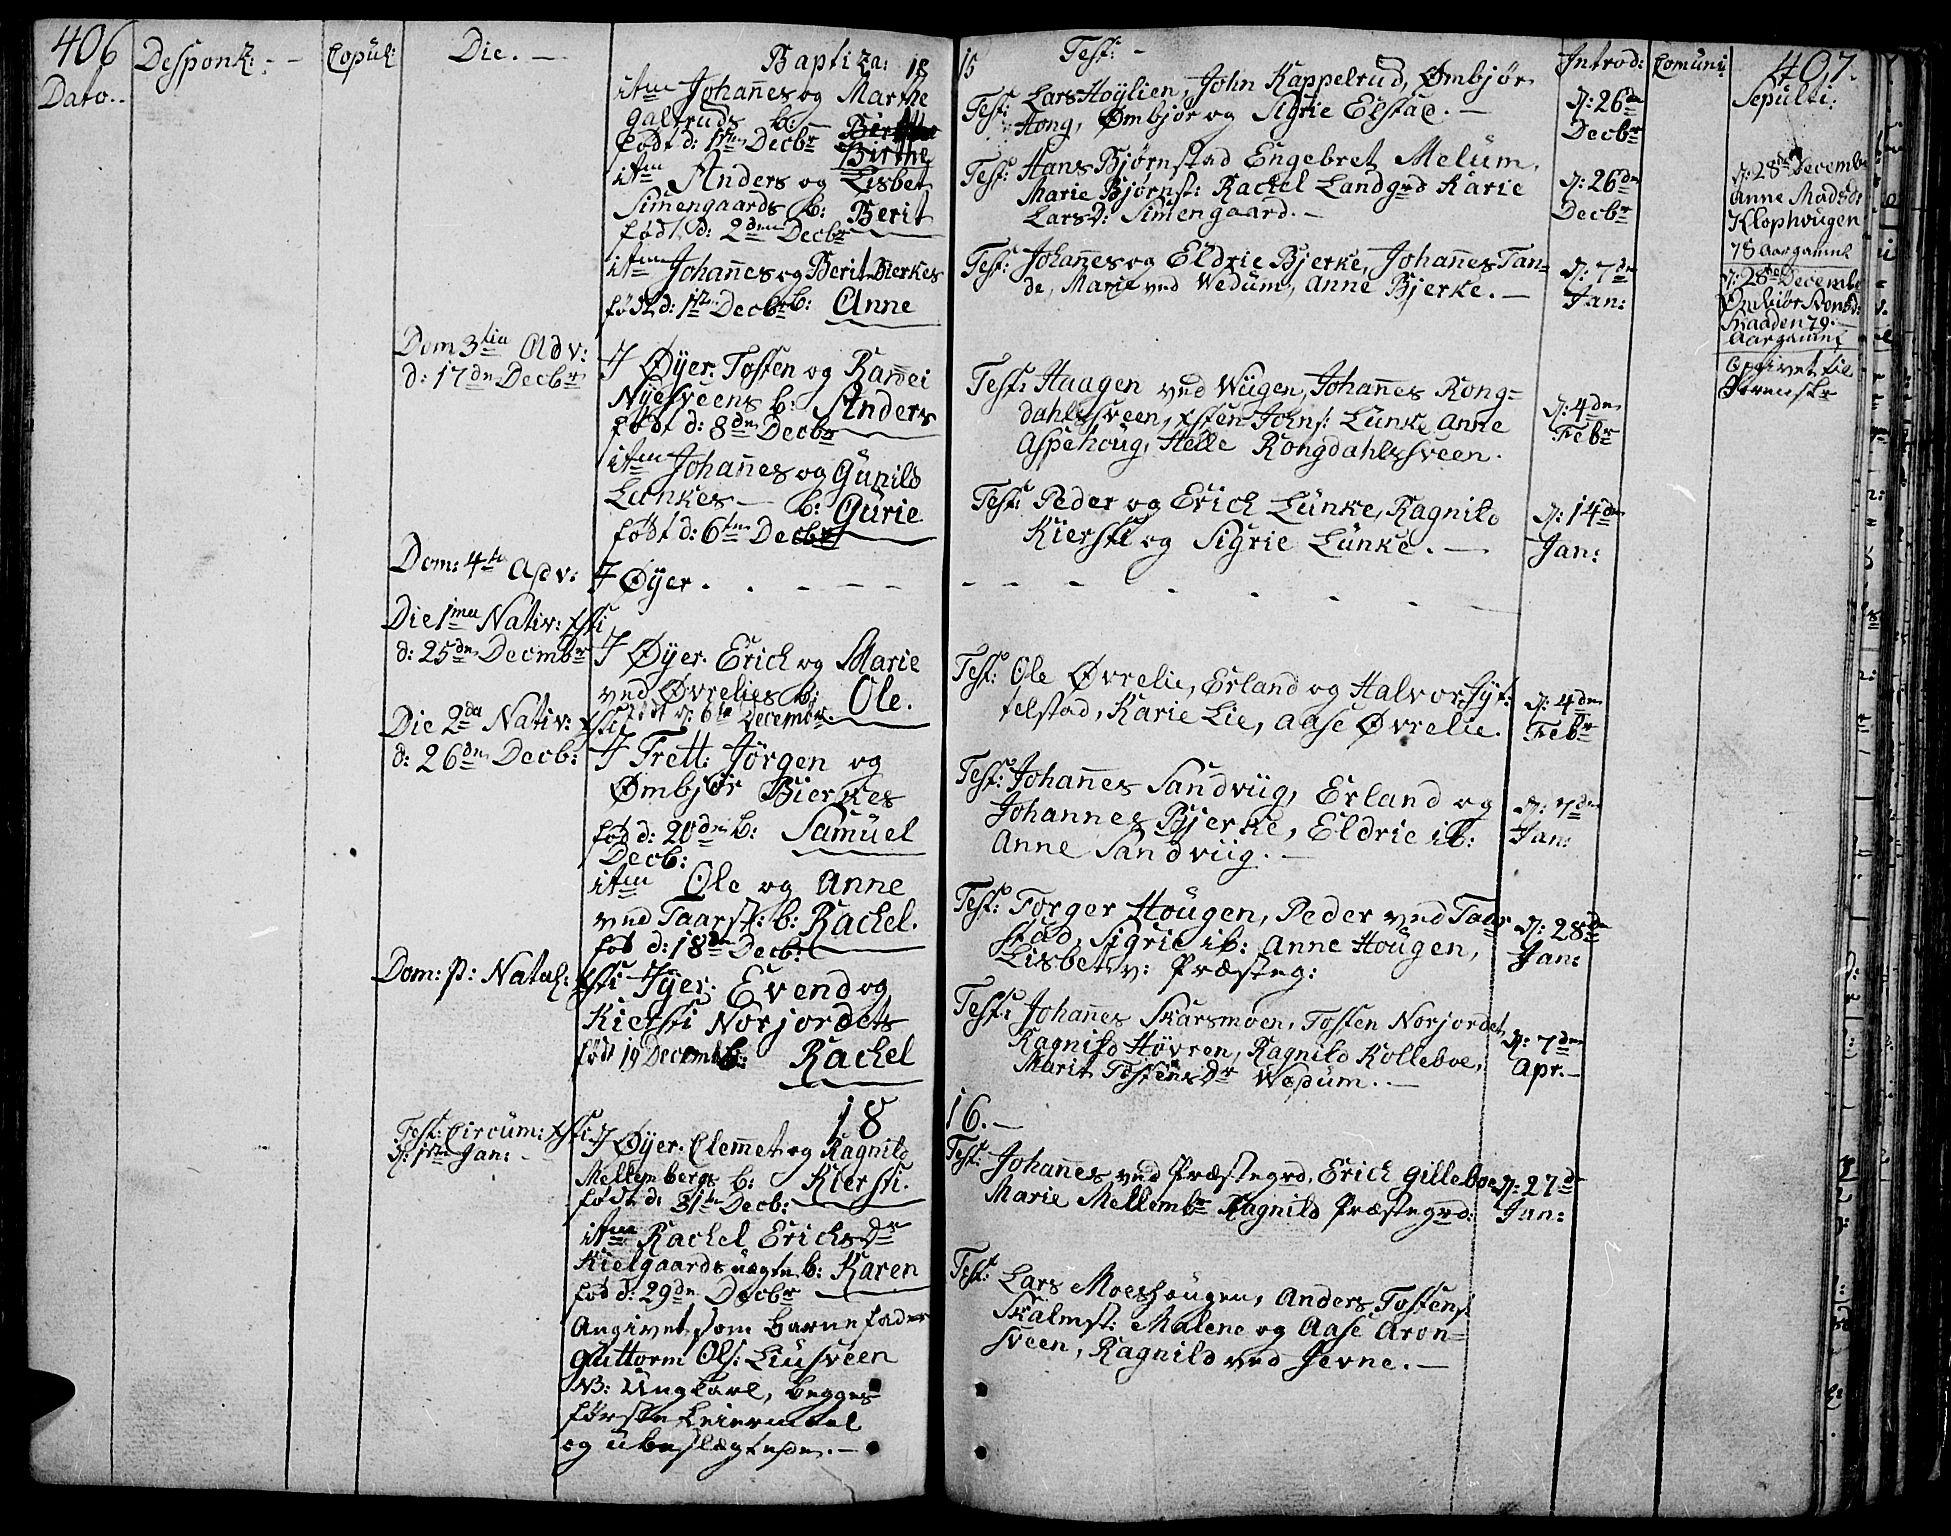 SAH, Øyer prestekontor, Parish register (official) no. 3, 1784-1824, p. 406-407